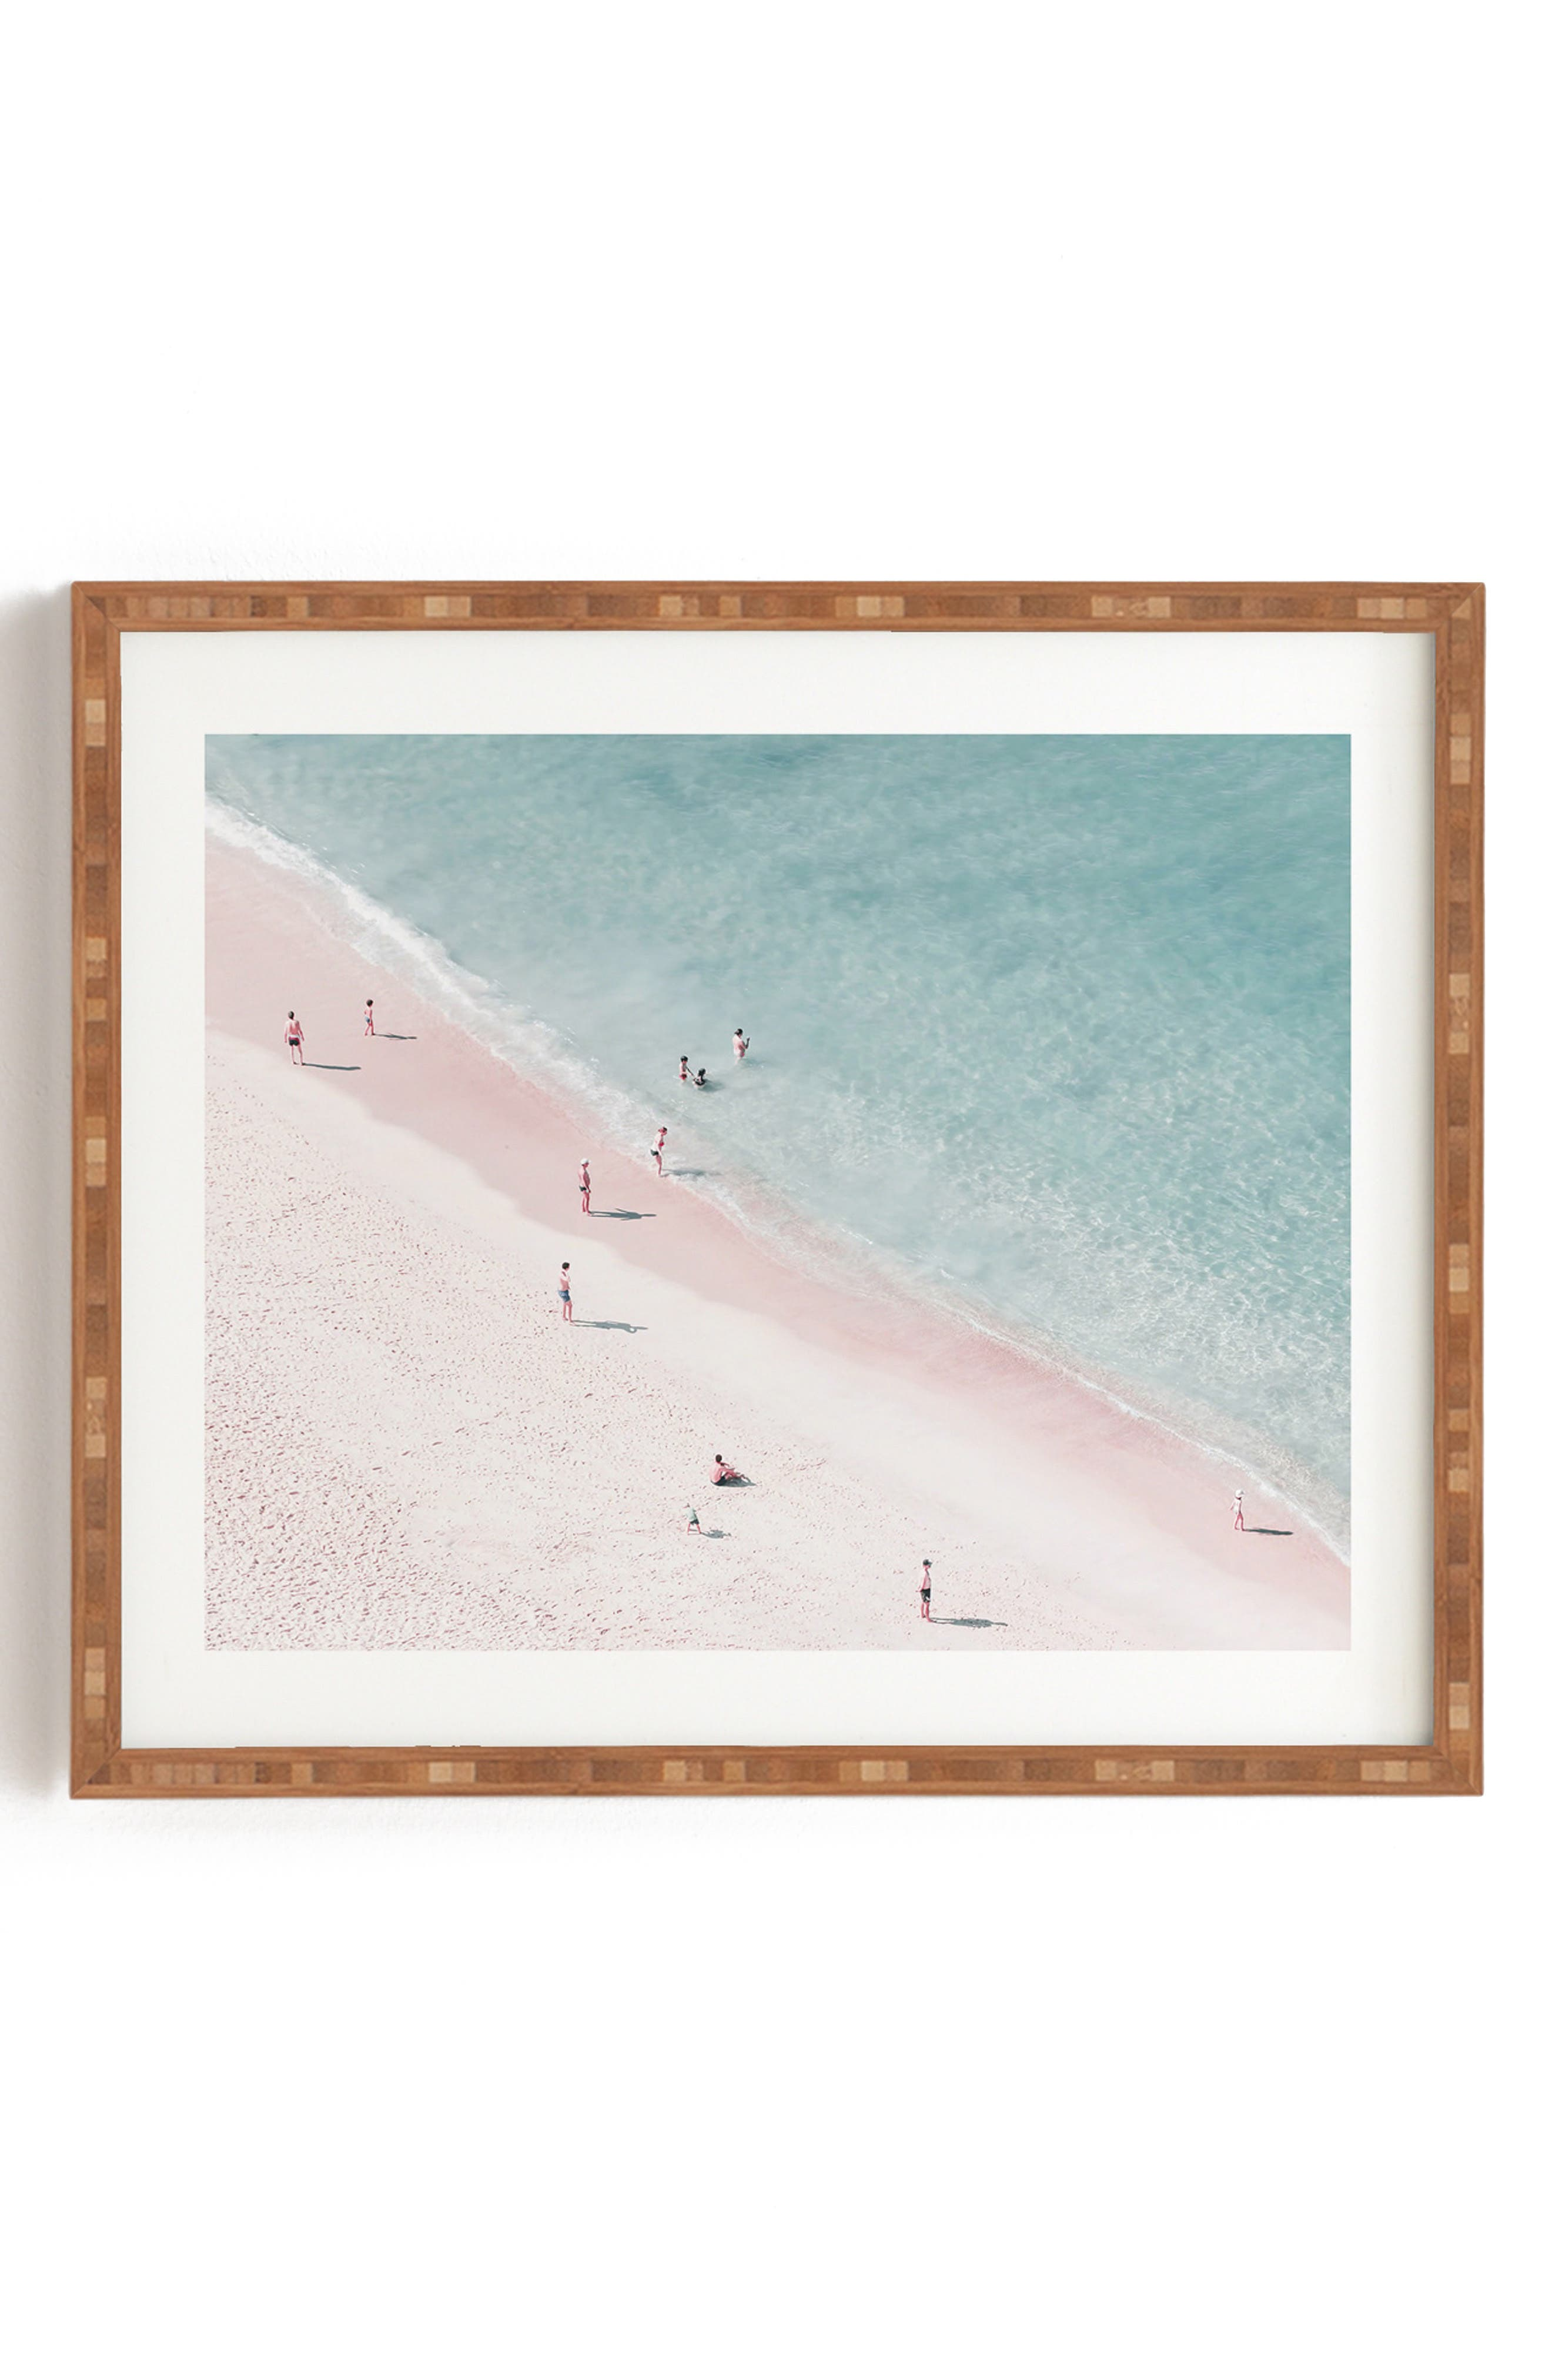 DENY DESIGNS, Ingrid Beddoes - Beach Summer of Love Framed Wall Art, Main thumbnail 1, color, PINK